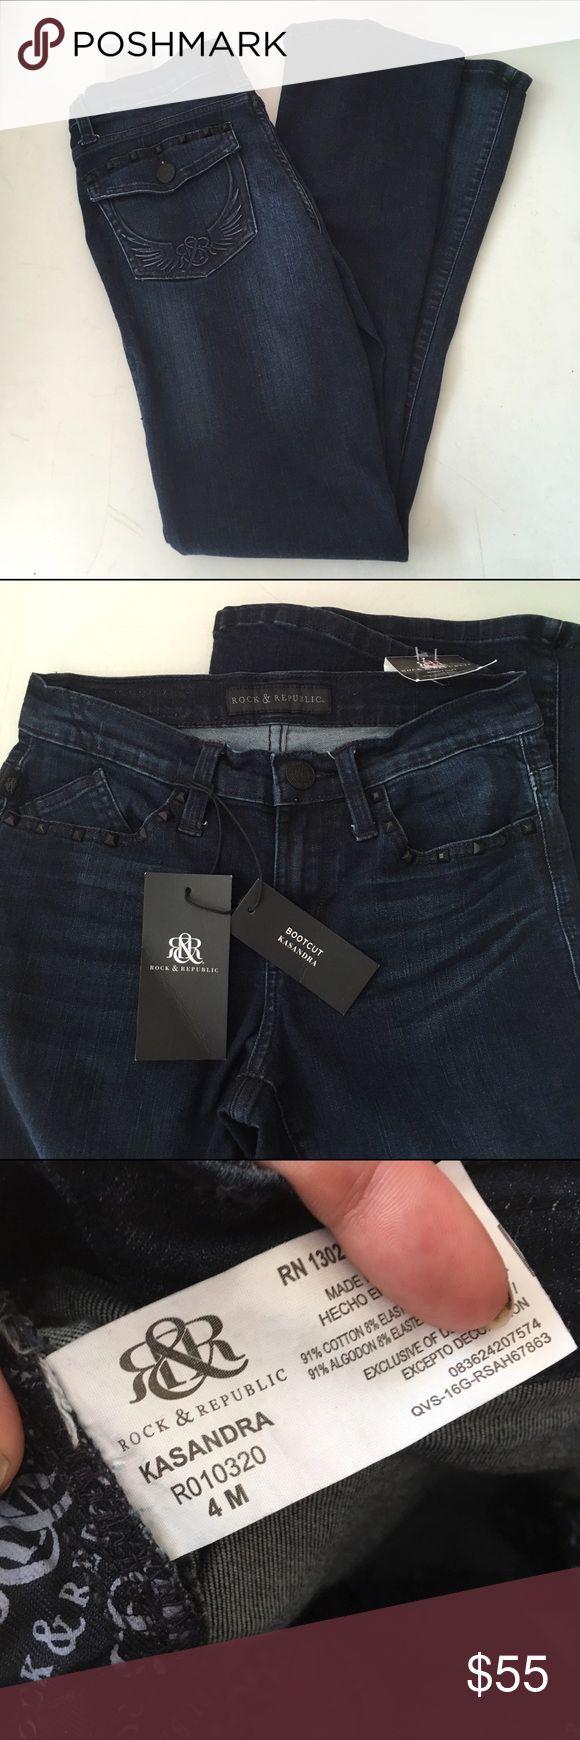 Rock & Republic Bootcut Jeans NWT Size 4 Rock & Republic Bootcut Jeans NWT Size 4 Rock & Republic Jeans Boot Cut